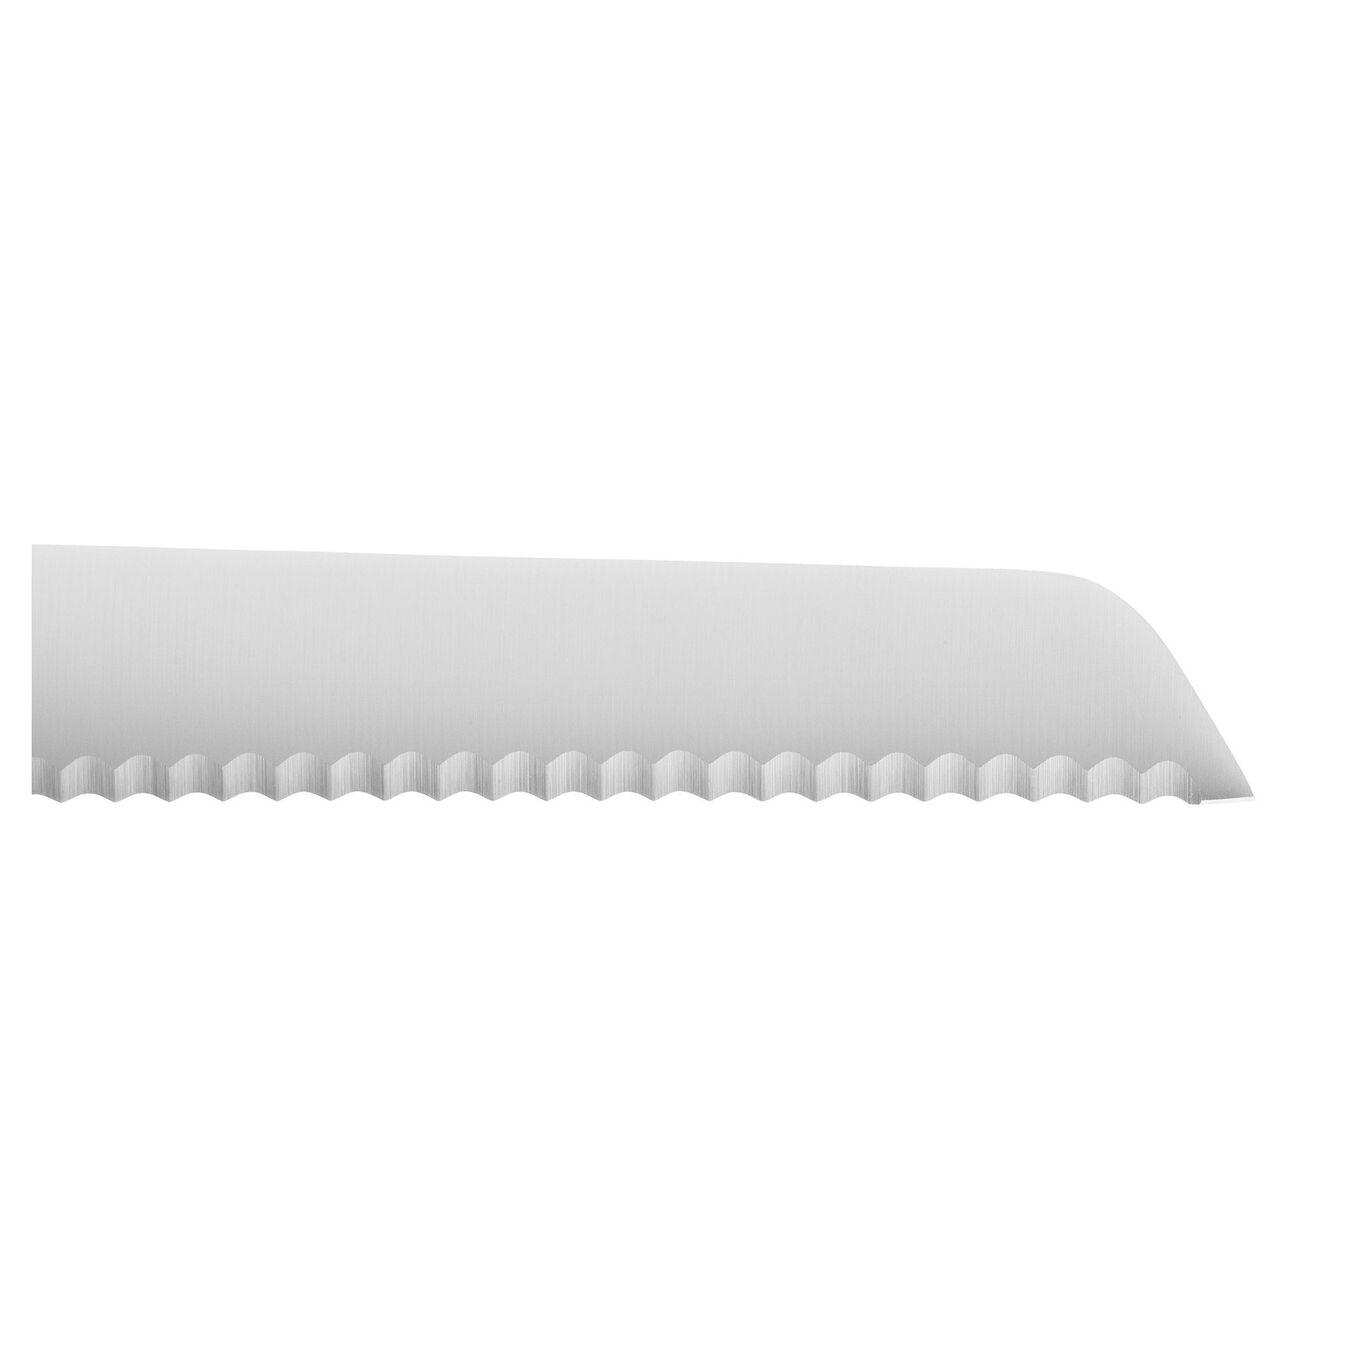 Brotmesser 20 cm,,large 4